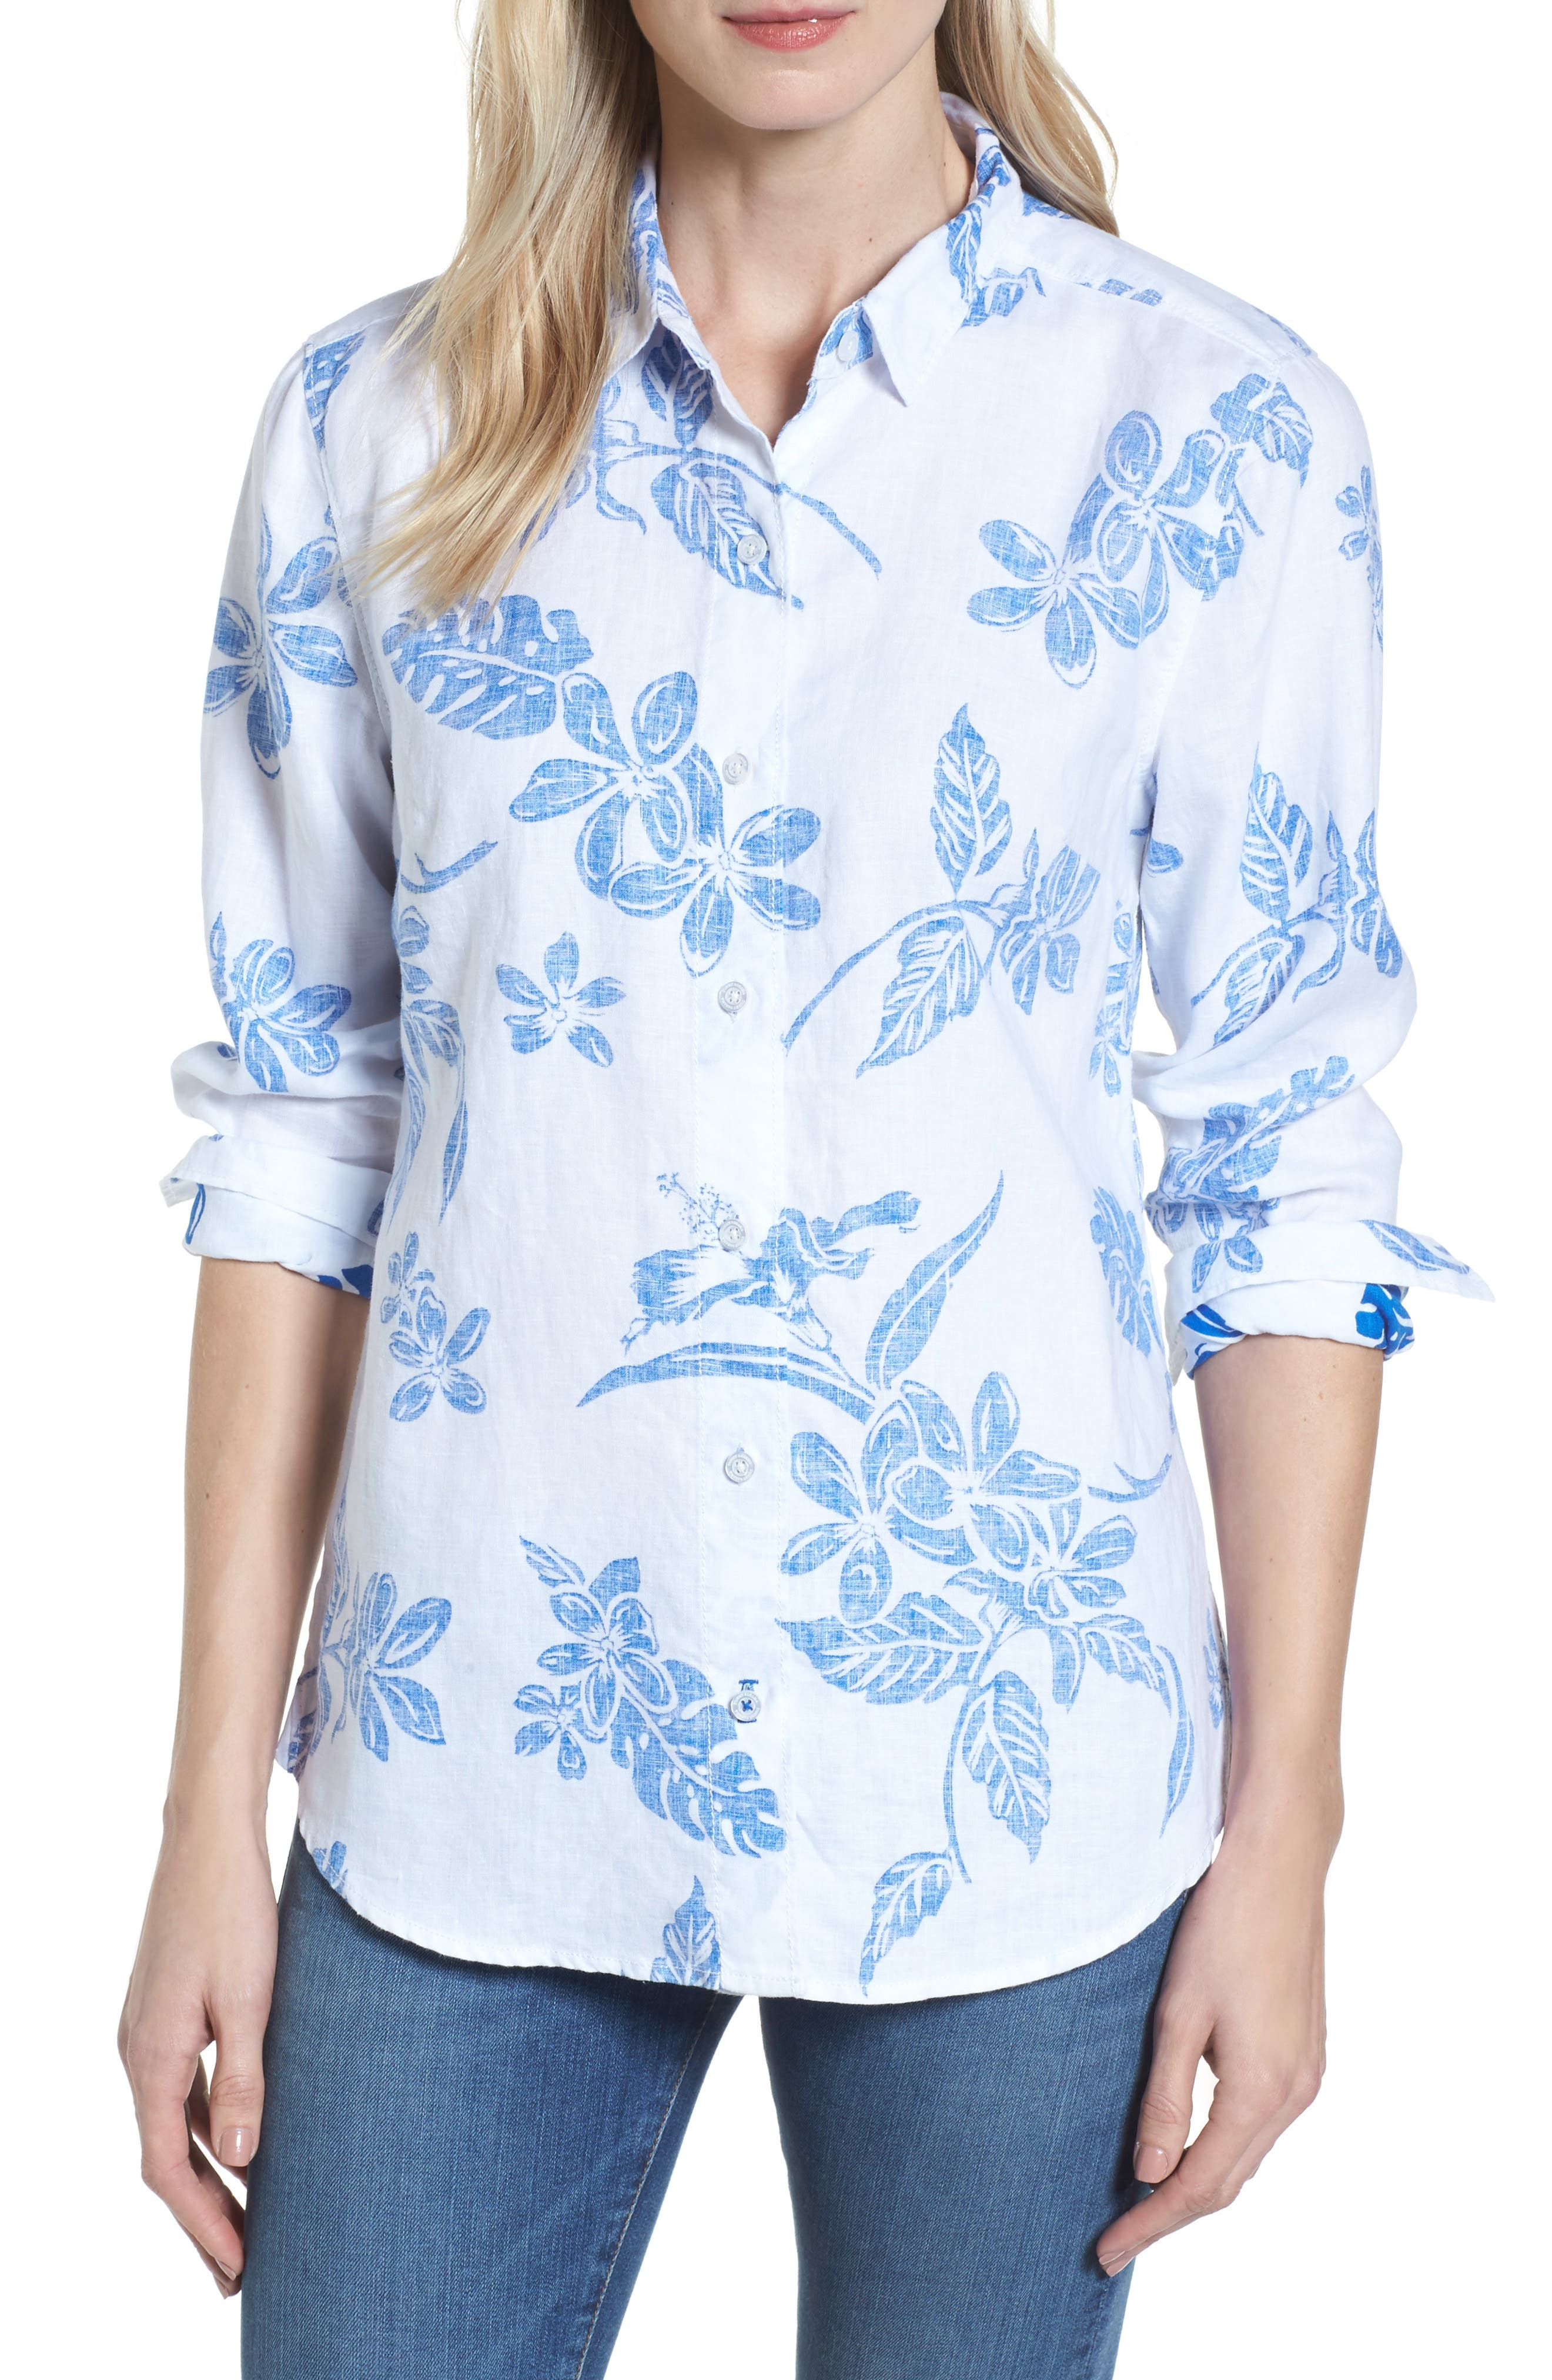 Hibiscus Hiatus Long Sleeve Top,                         Main,                         color, WHITE/ COBALT